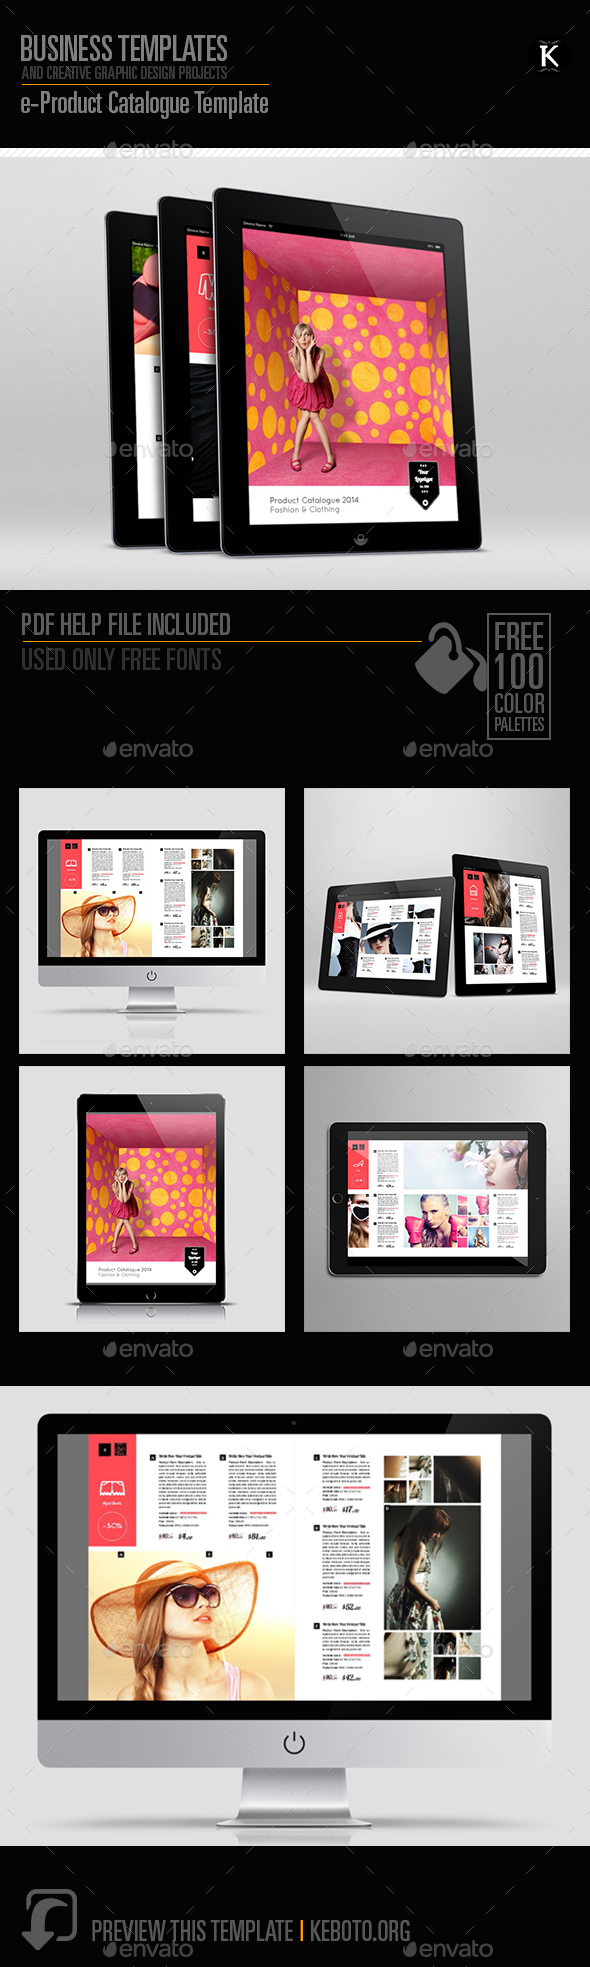 e-Product Catalogue Template - ePublishing